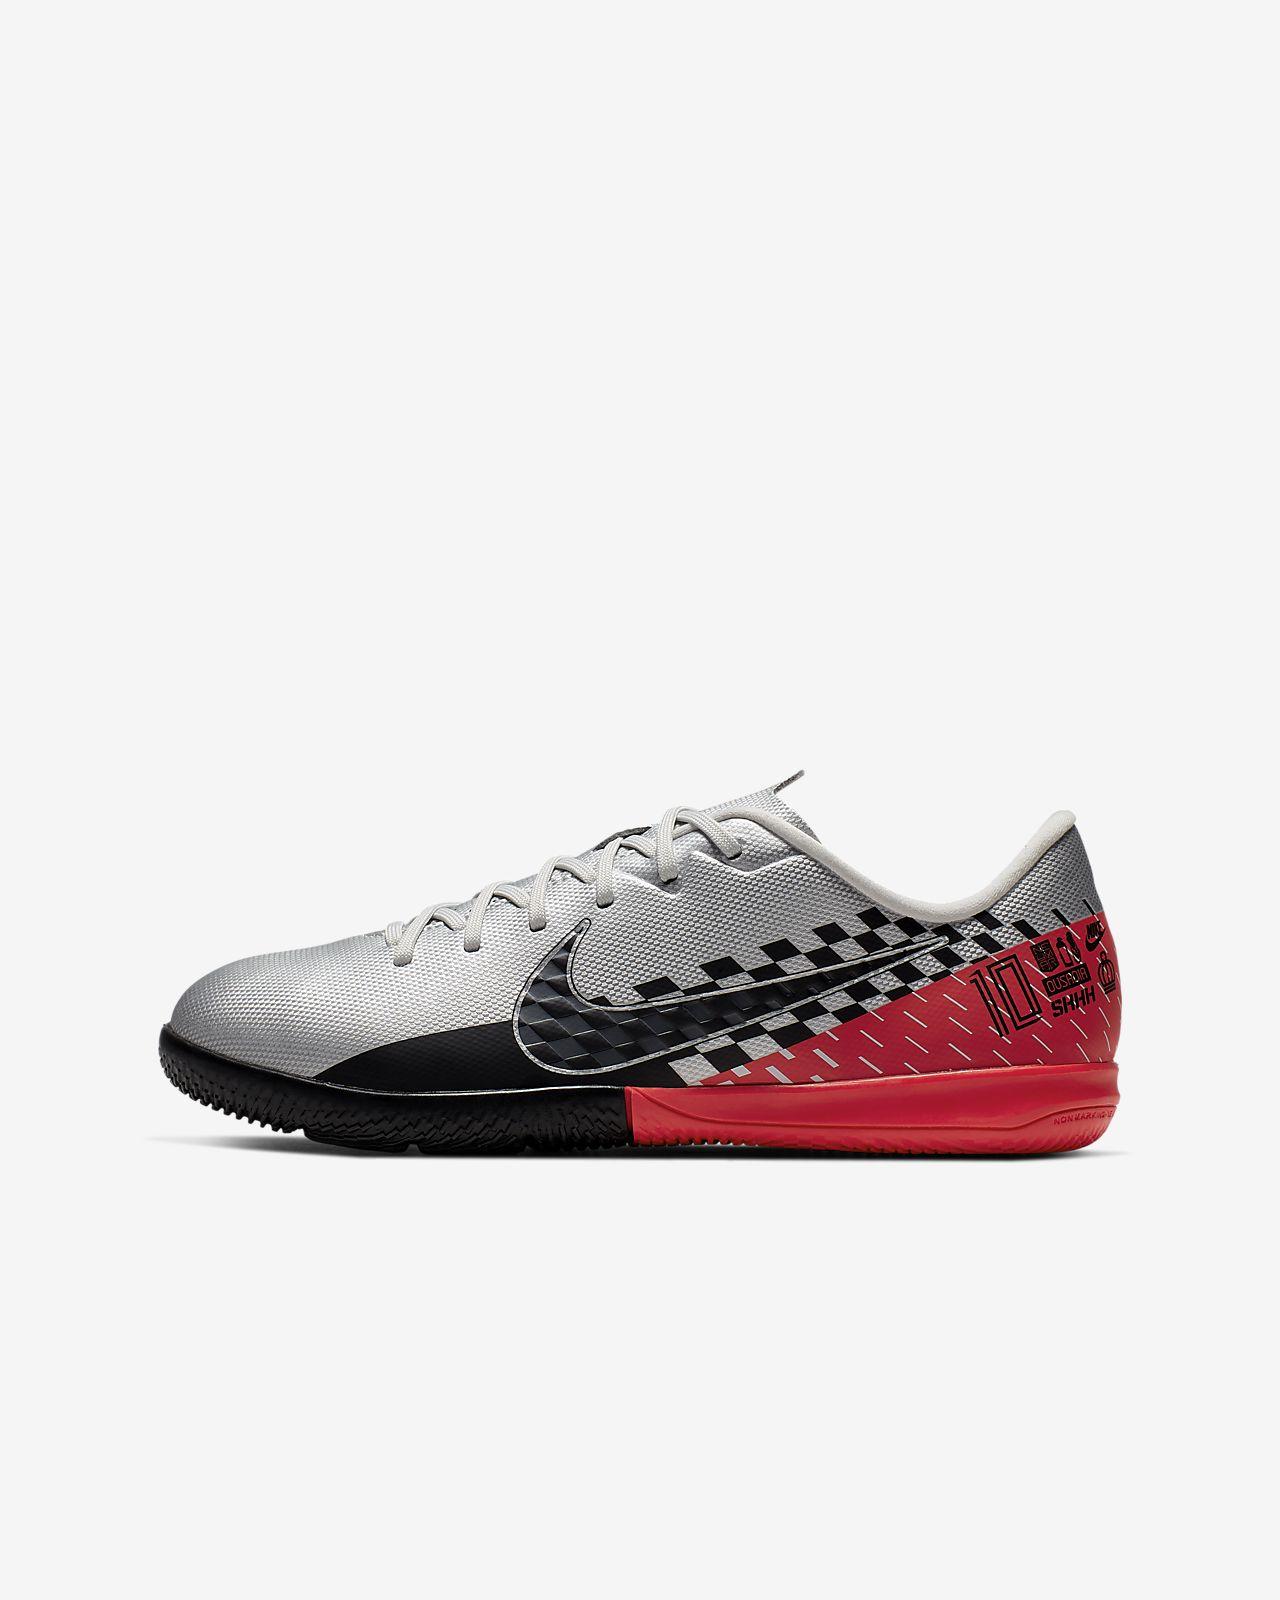 Nike Jr. Mercurial Vapor 13 Academy Neymar Jr. IC Botas de fútbol sala - Niño/a